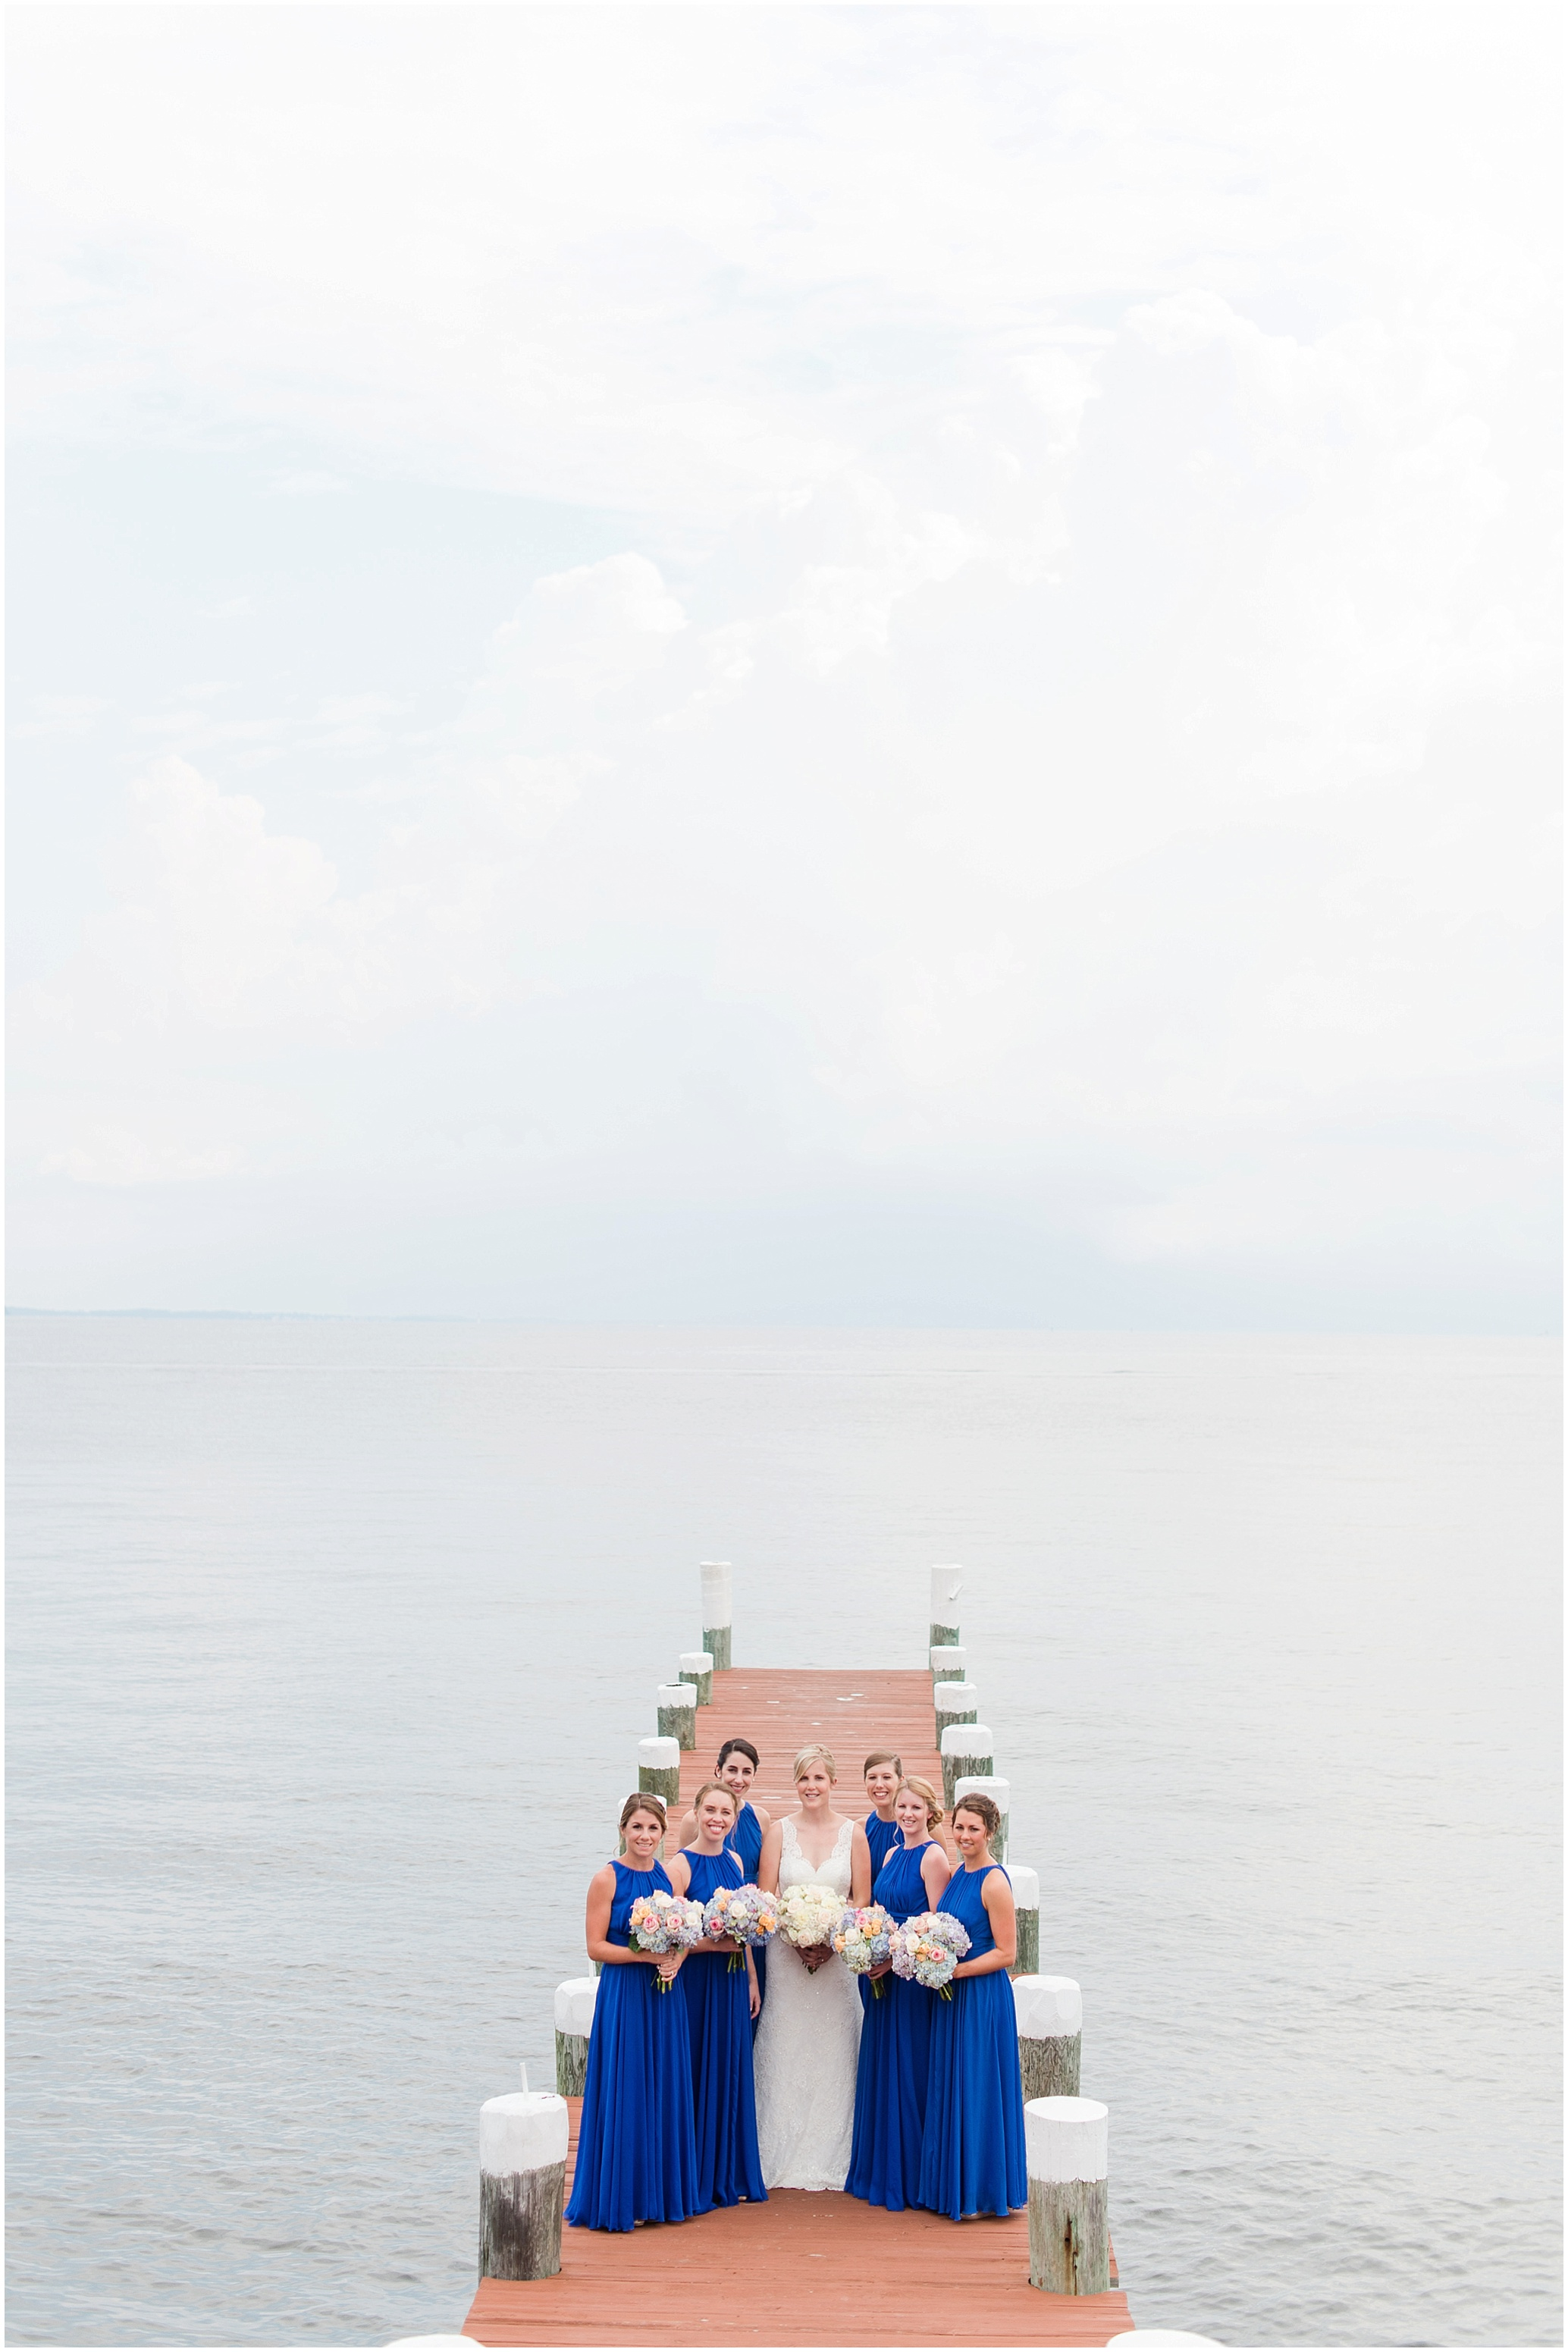 Hannah Leigh Photography Celebrations at the Bay Wedding_0958.jpg